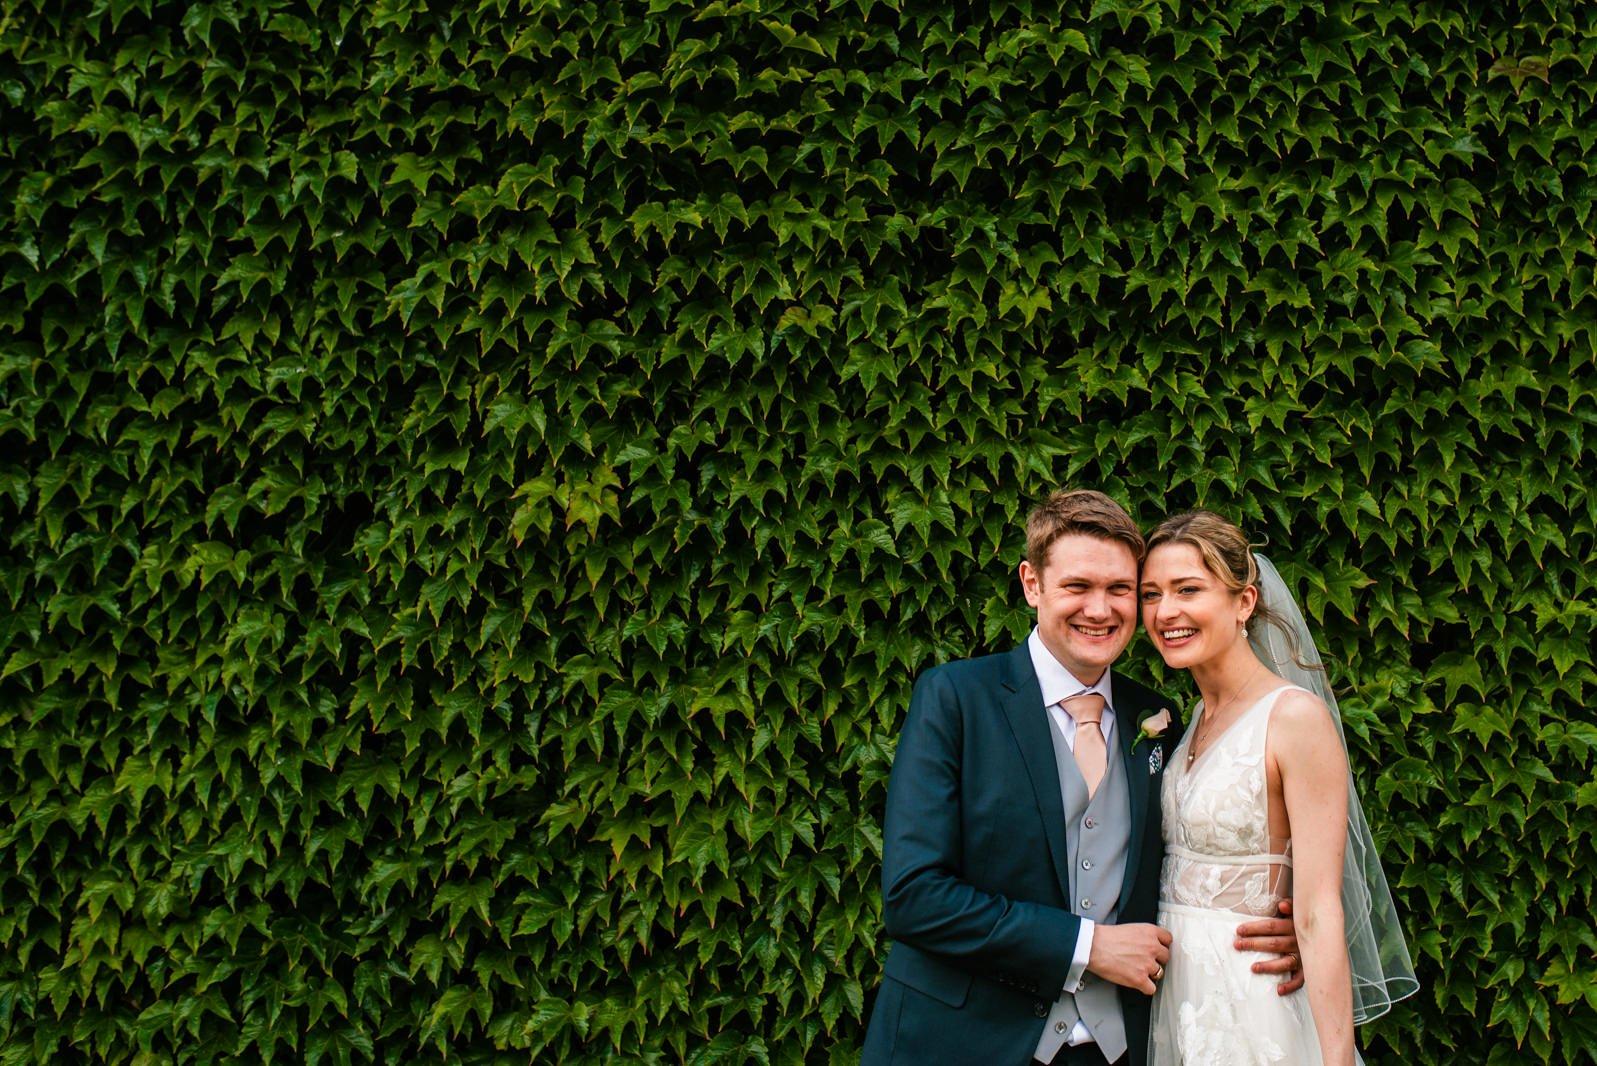 Beautiful Lillibrooke Manor Wedding - Ksenia & Iain 131